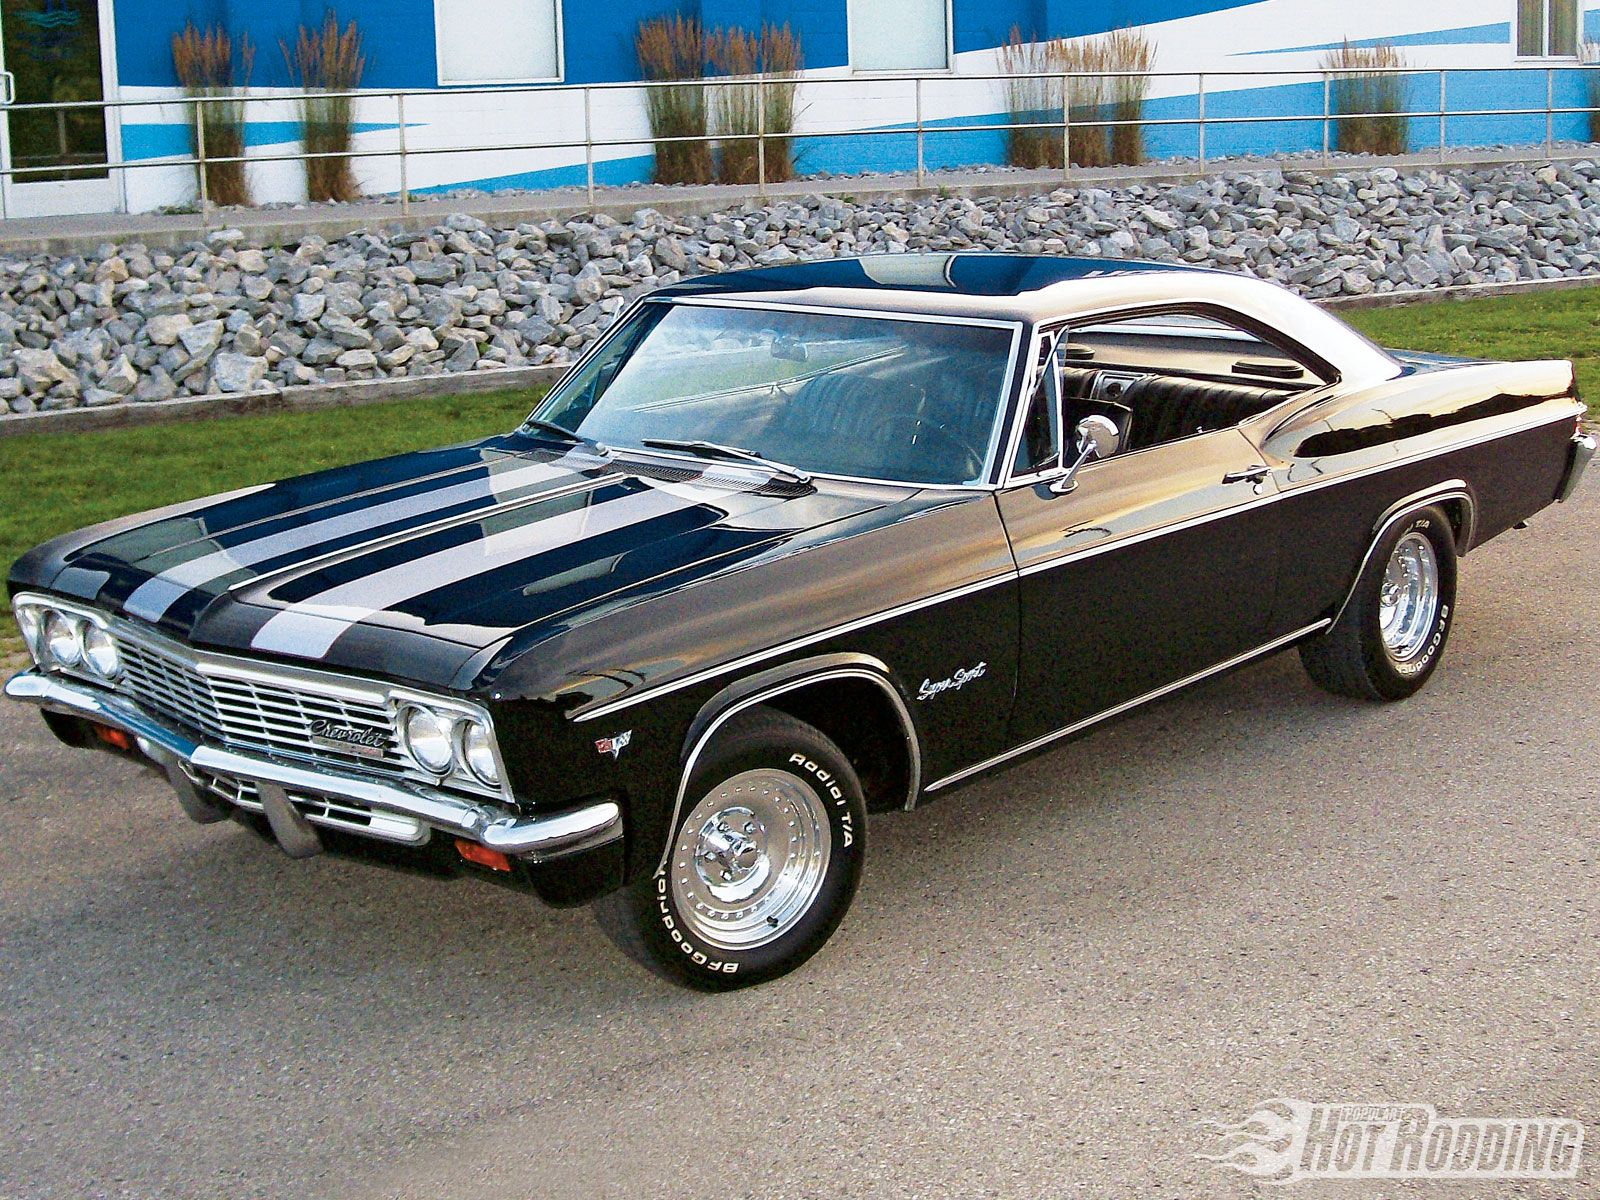 Bild från http://picwall2.com/images/2015/chevrolet-impala/chevrolet-impala-02.jpg.